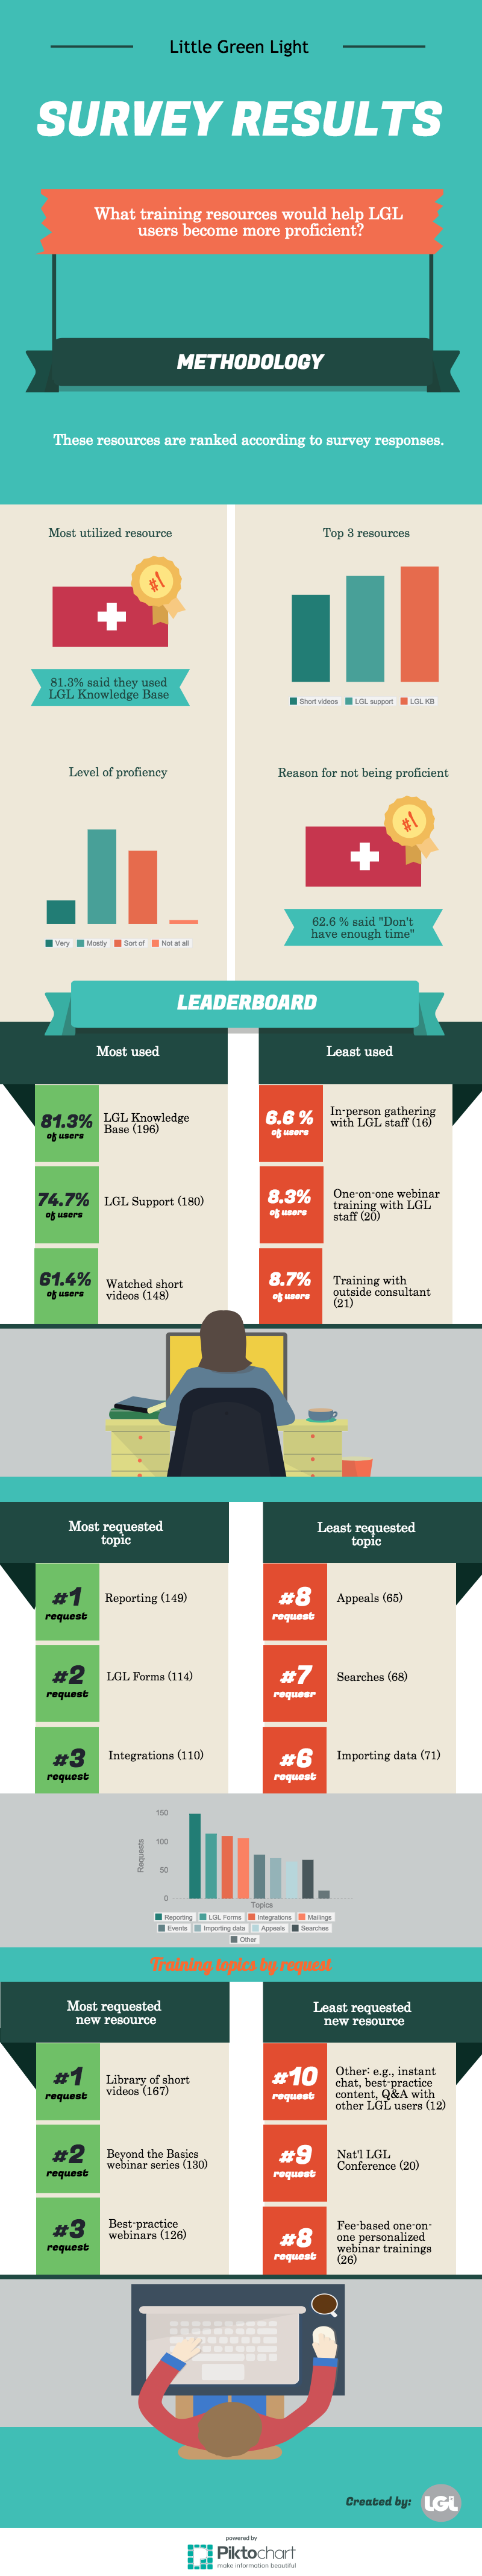 LGL Training Survey Infographic